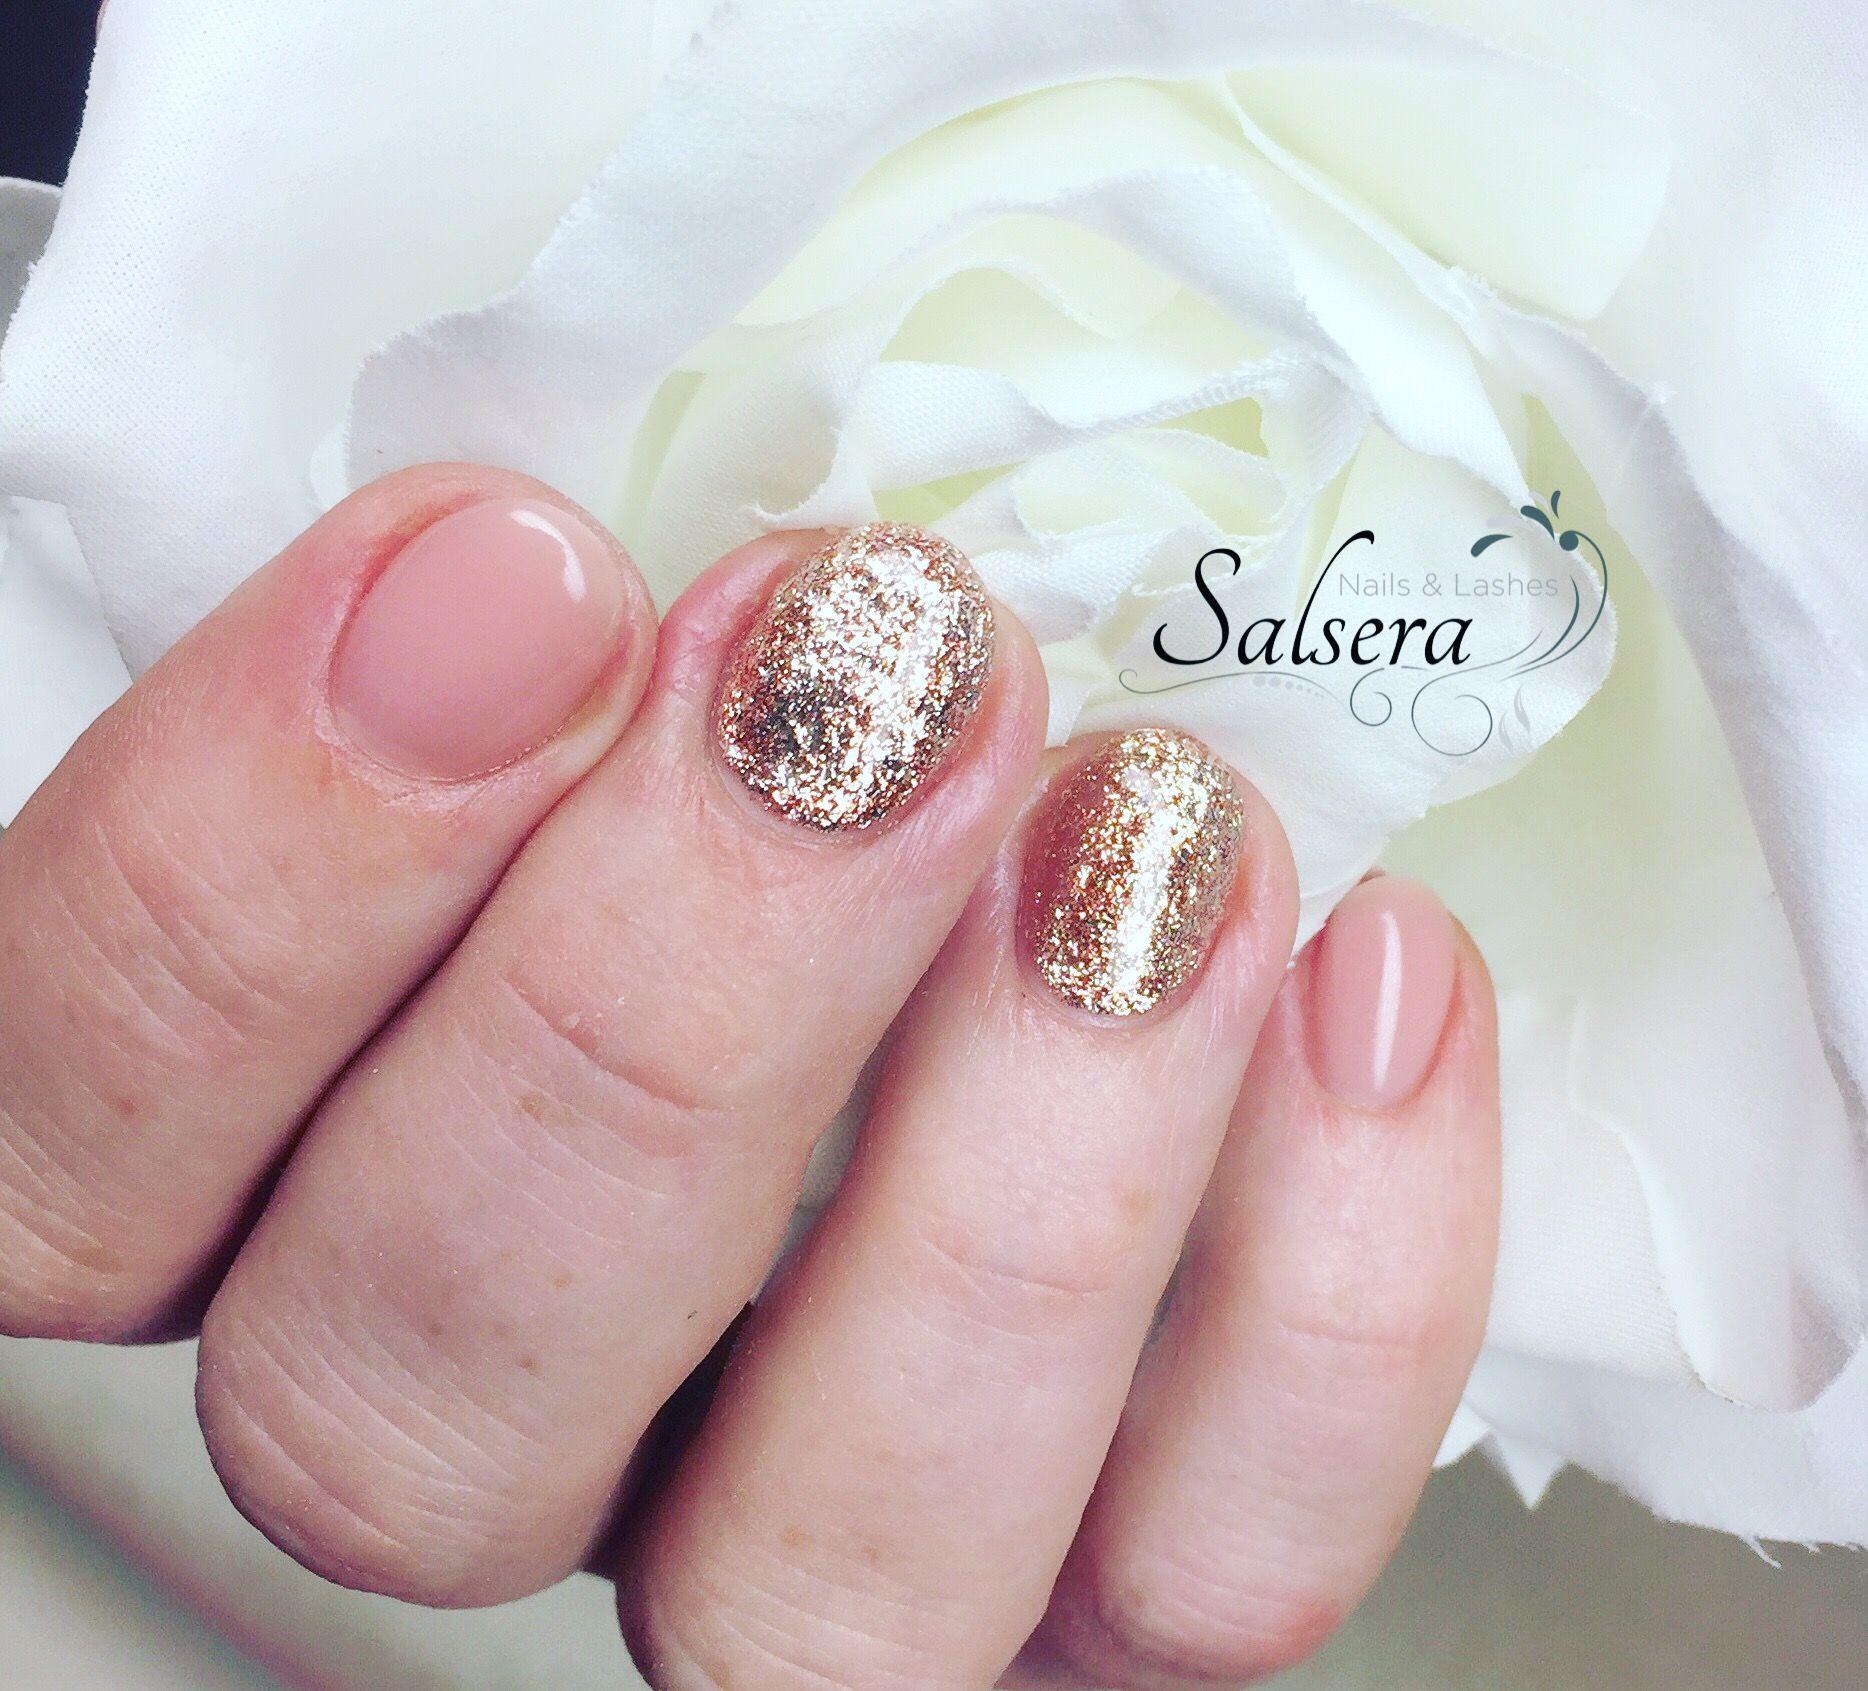 Nude Nails Glitter Nails Shortnails Gepflegte Hände Salsera Nails ...